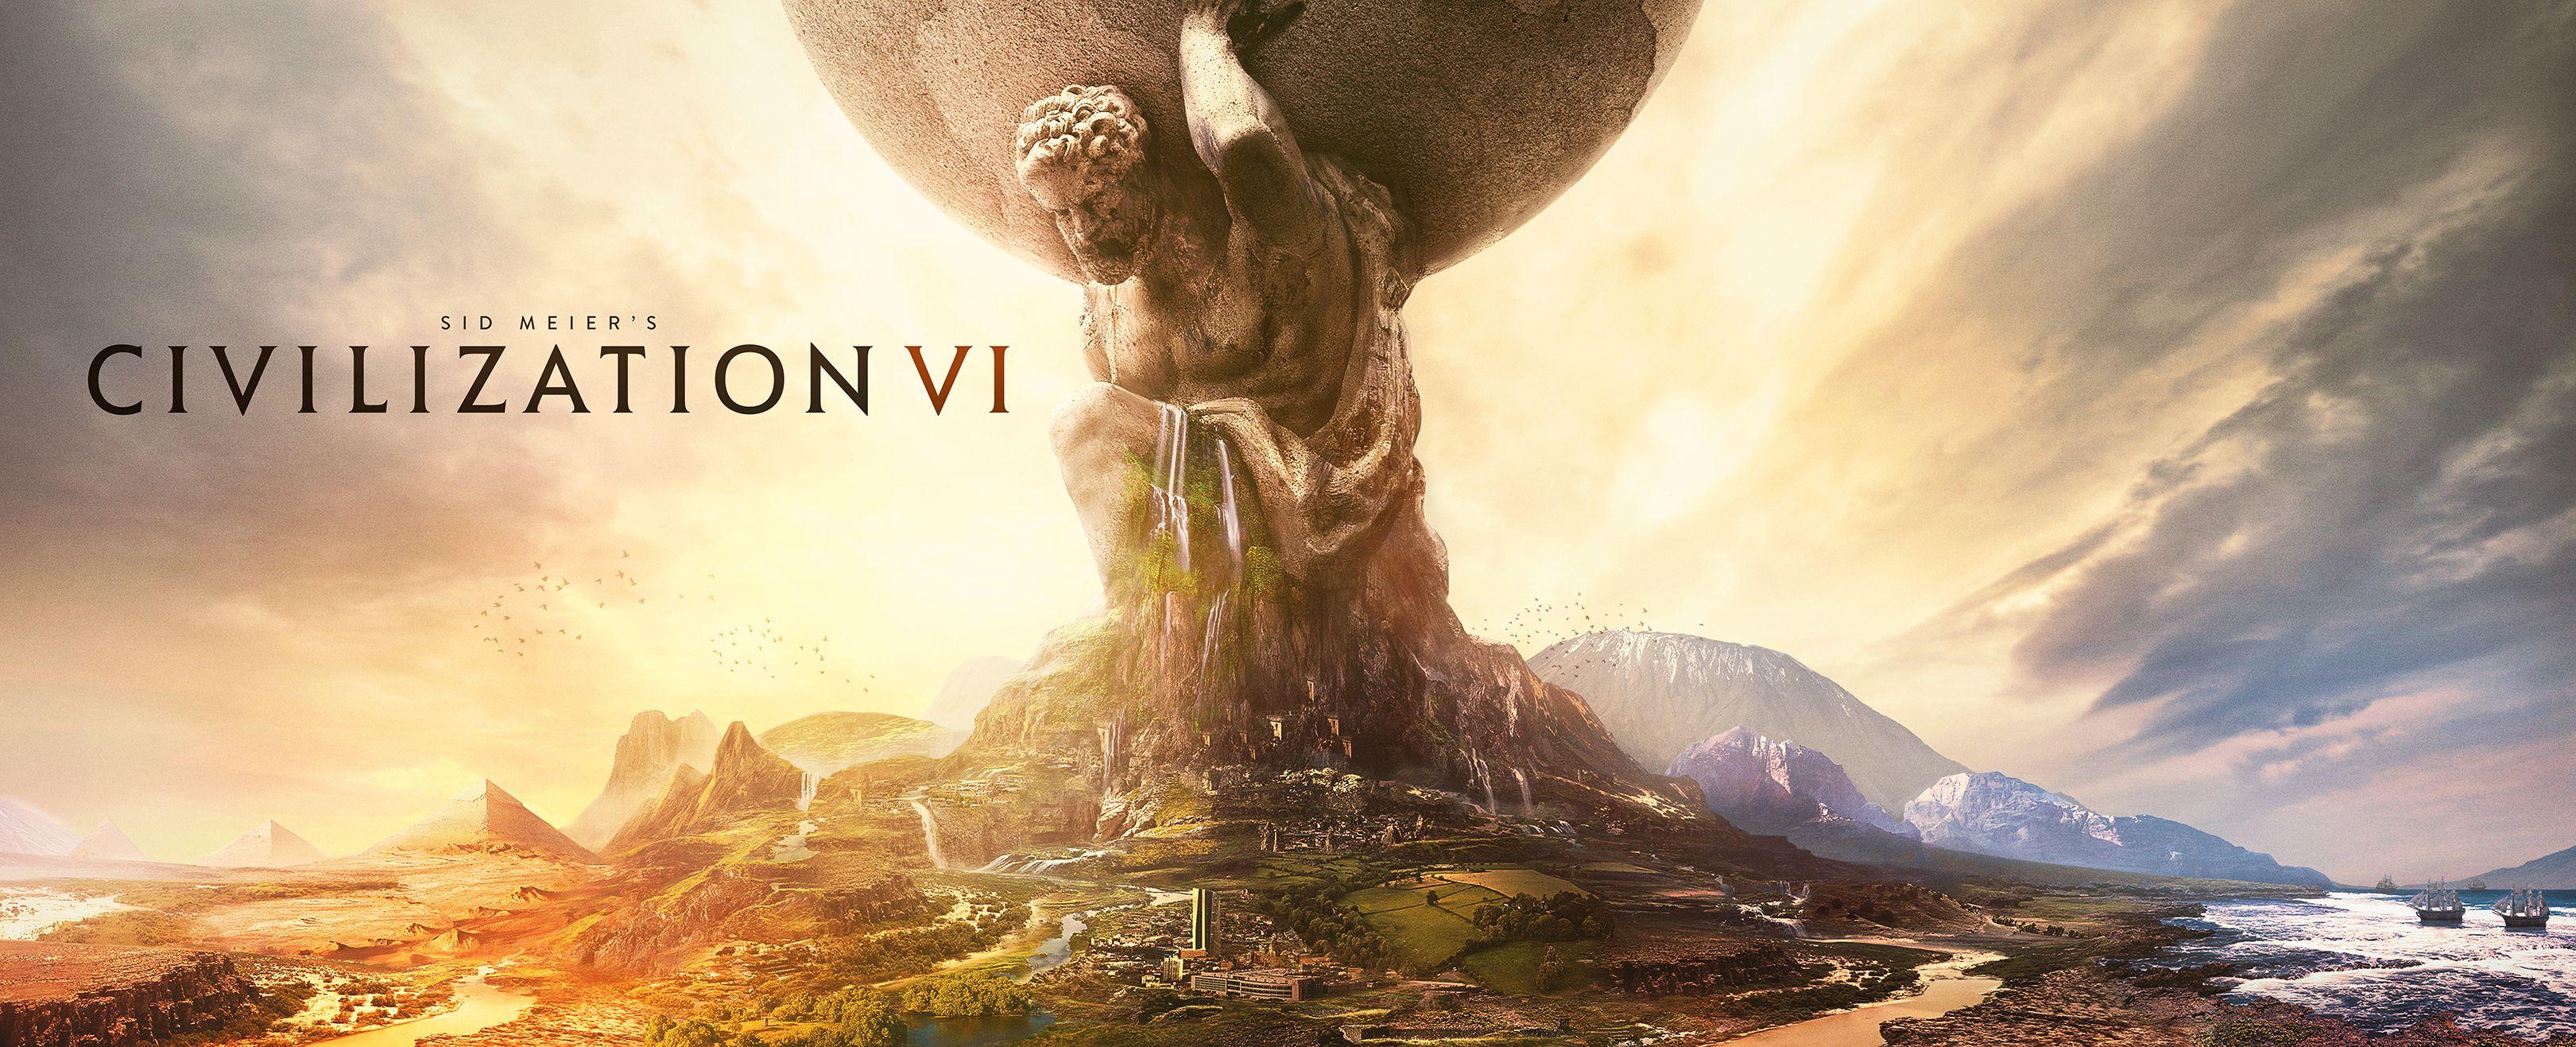 The logo for Sid Meier's Civilization VI